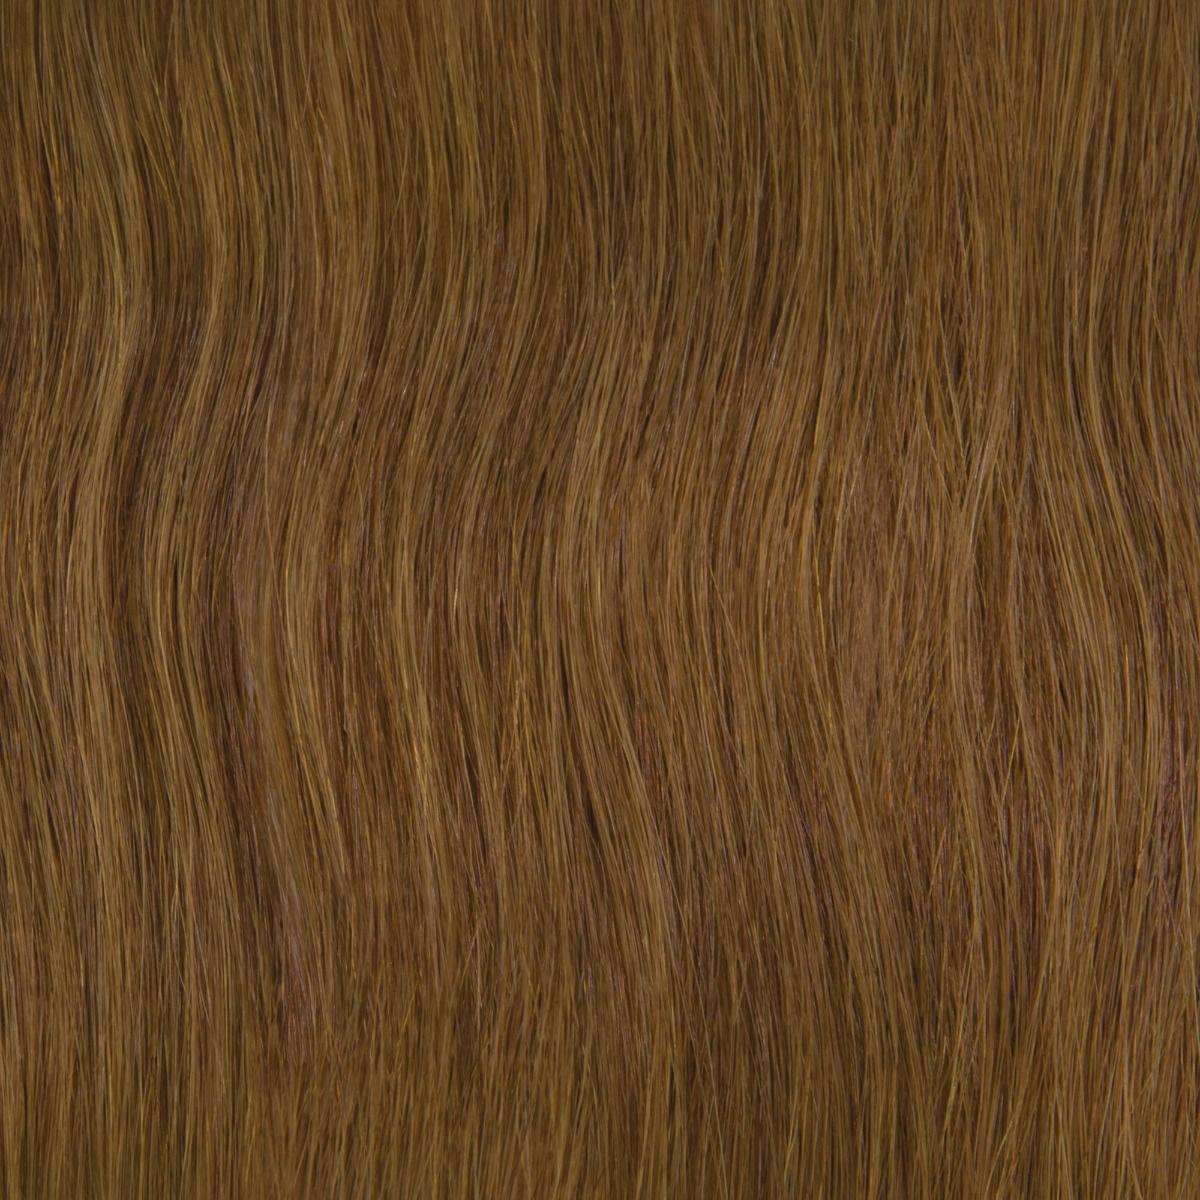 Afbeelding van Balmain Microring Extensions - natural straight - 40cm - #L8